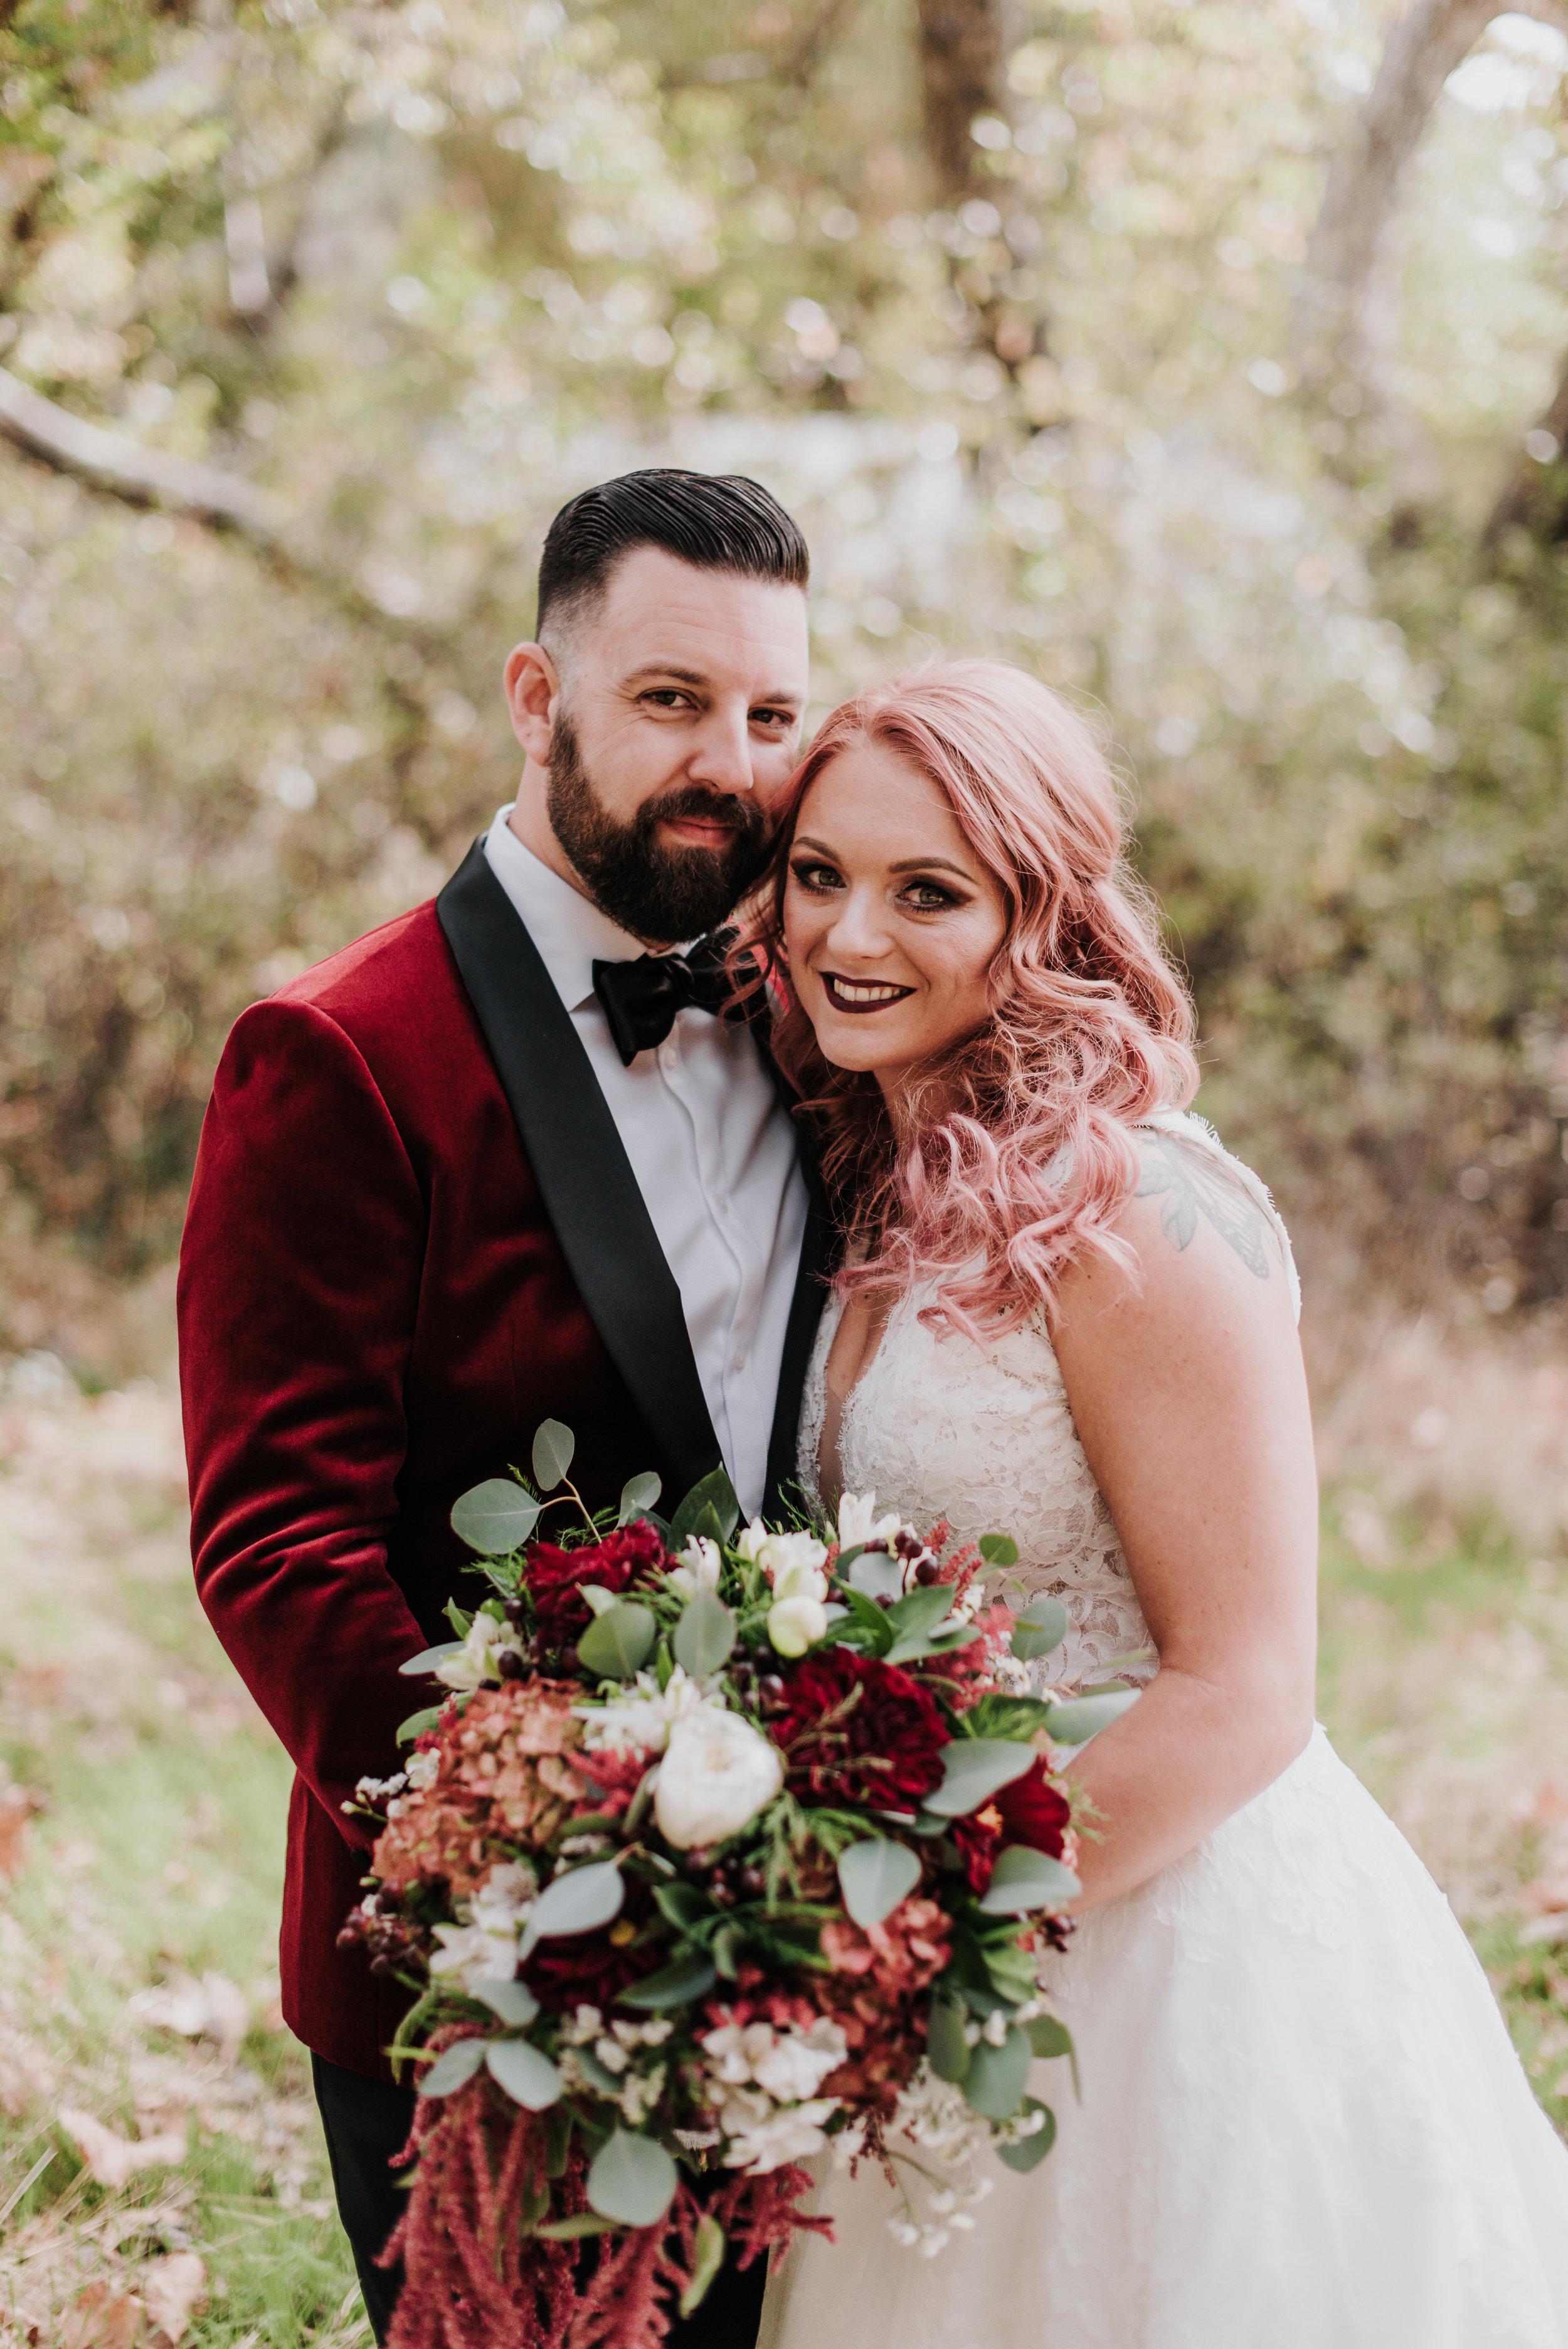 2018-11-04 Maresa and Nick - Married - Oak Glen-256.jpg